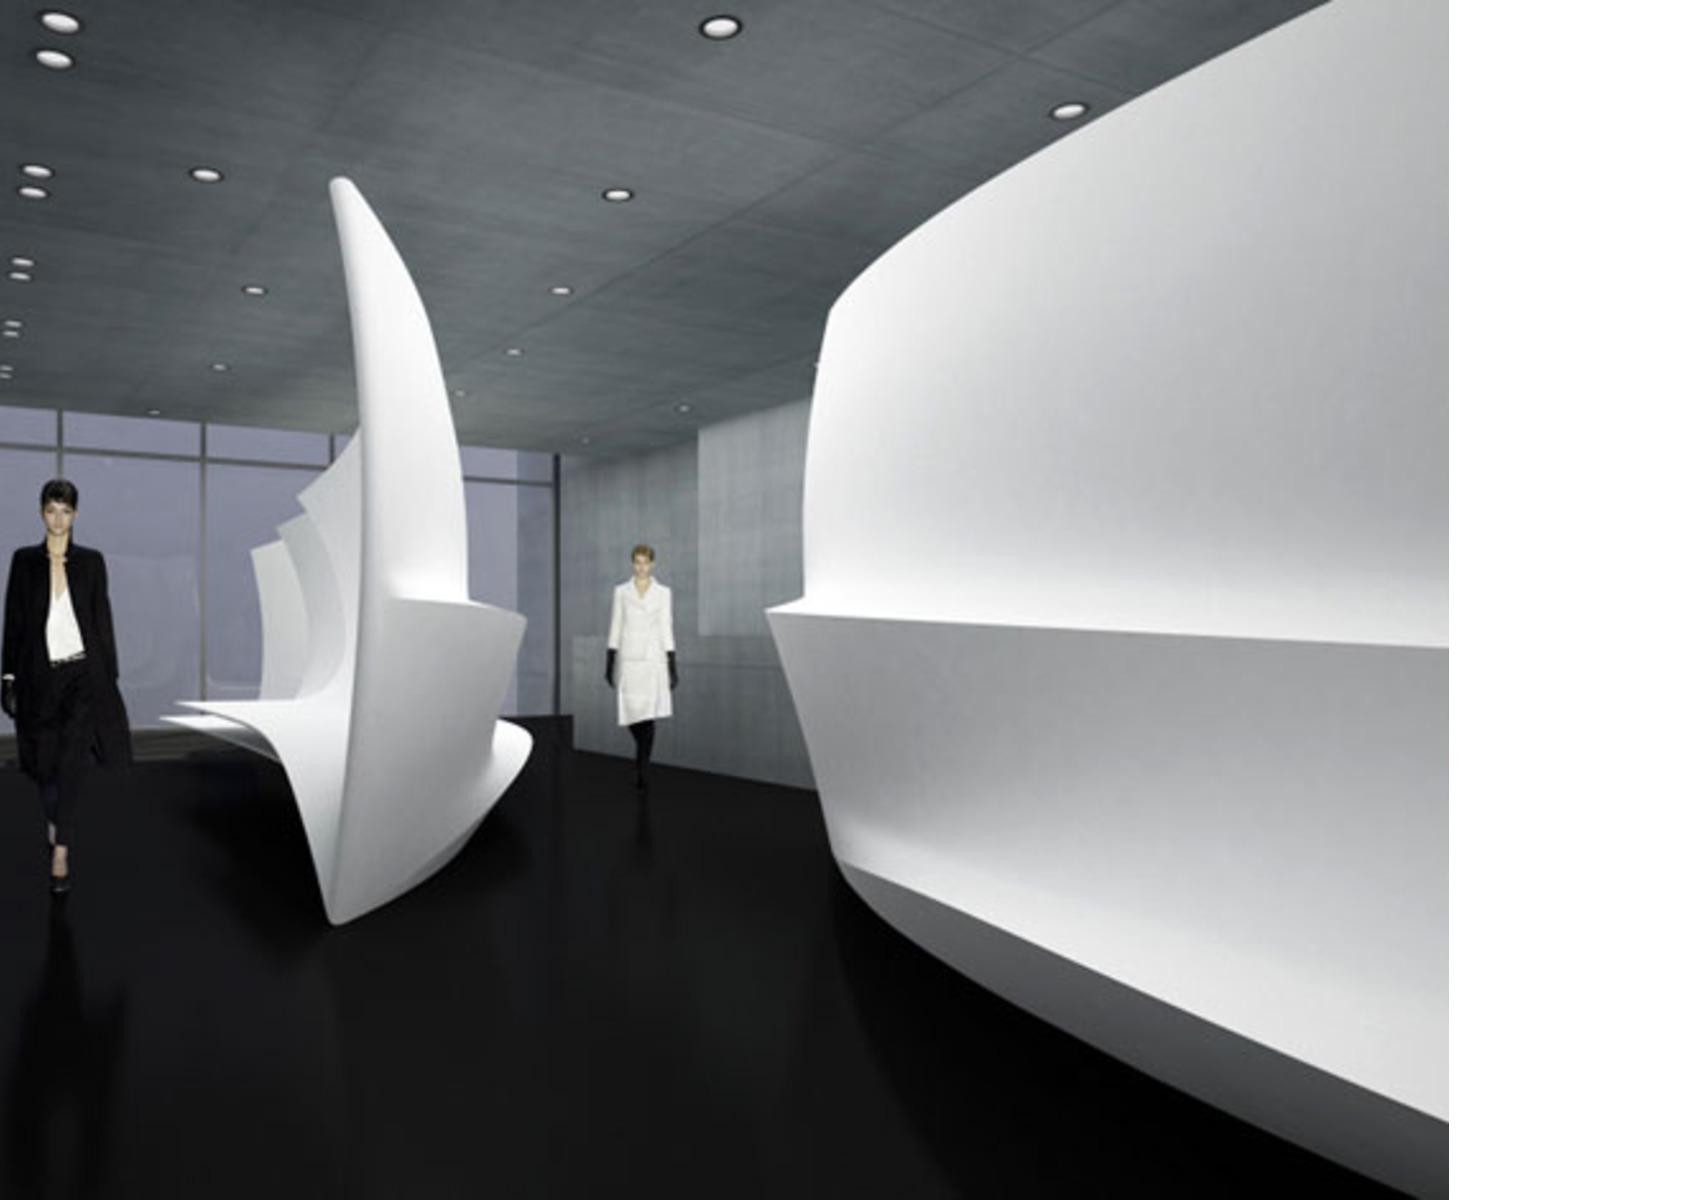 bien connu zaha hadid biographie ex59 aieasyspain. Black Bedroom Furniture Sets. Home Design Ideas